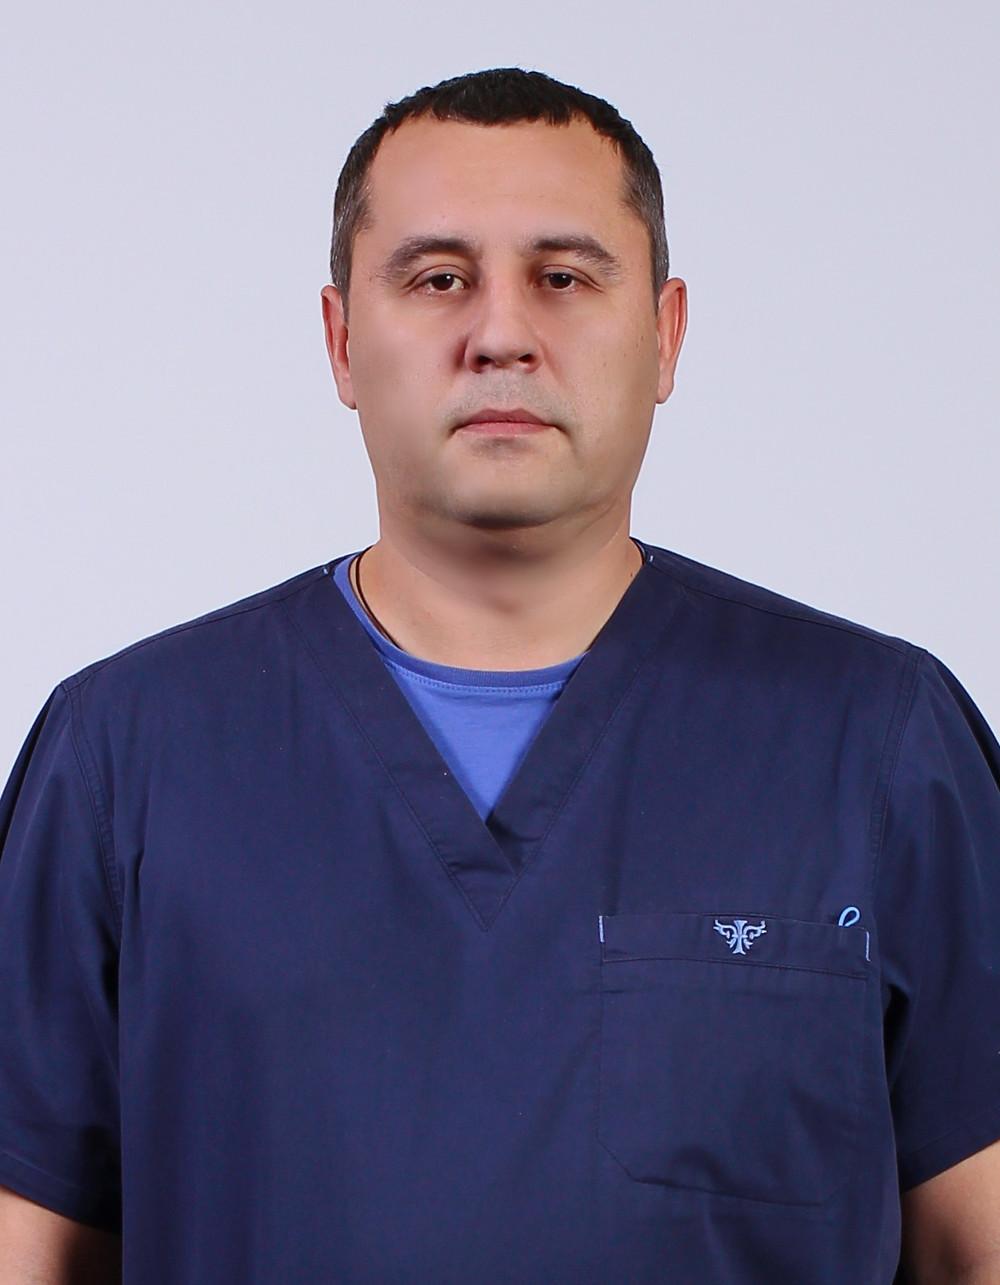 21 Кузнецов Михаил Викторович лор врач лор 2.JPG